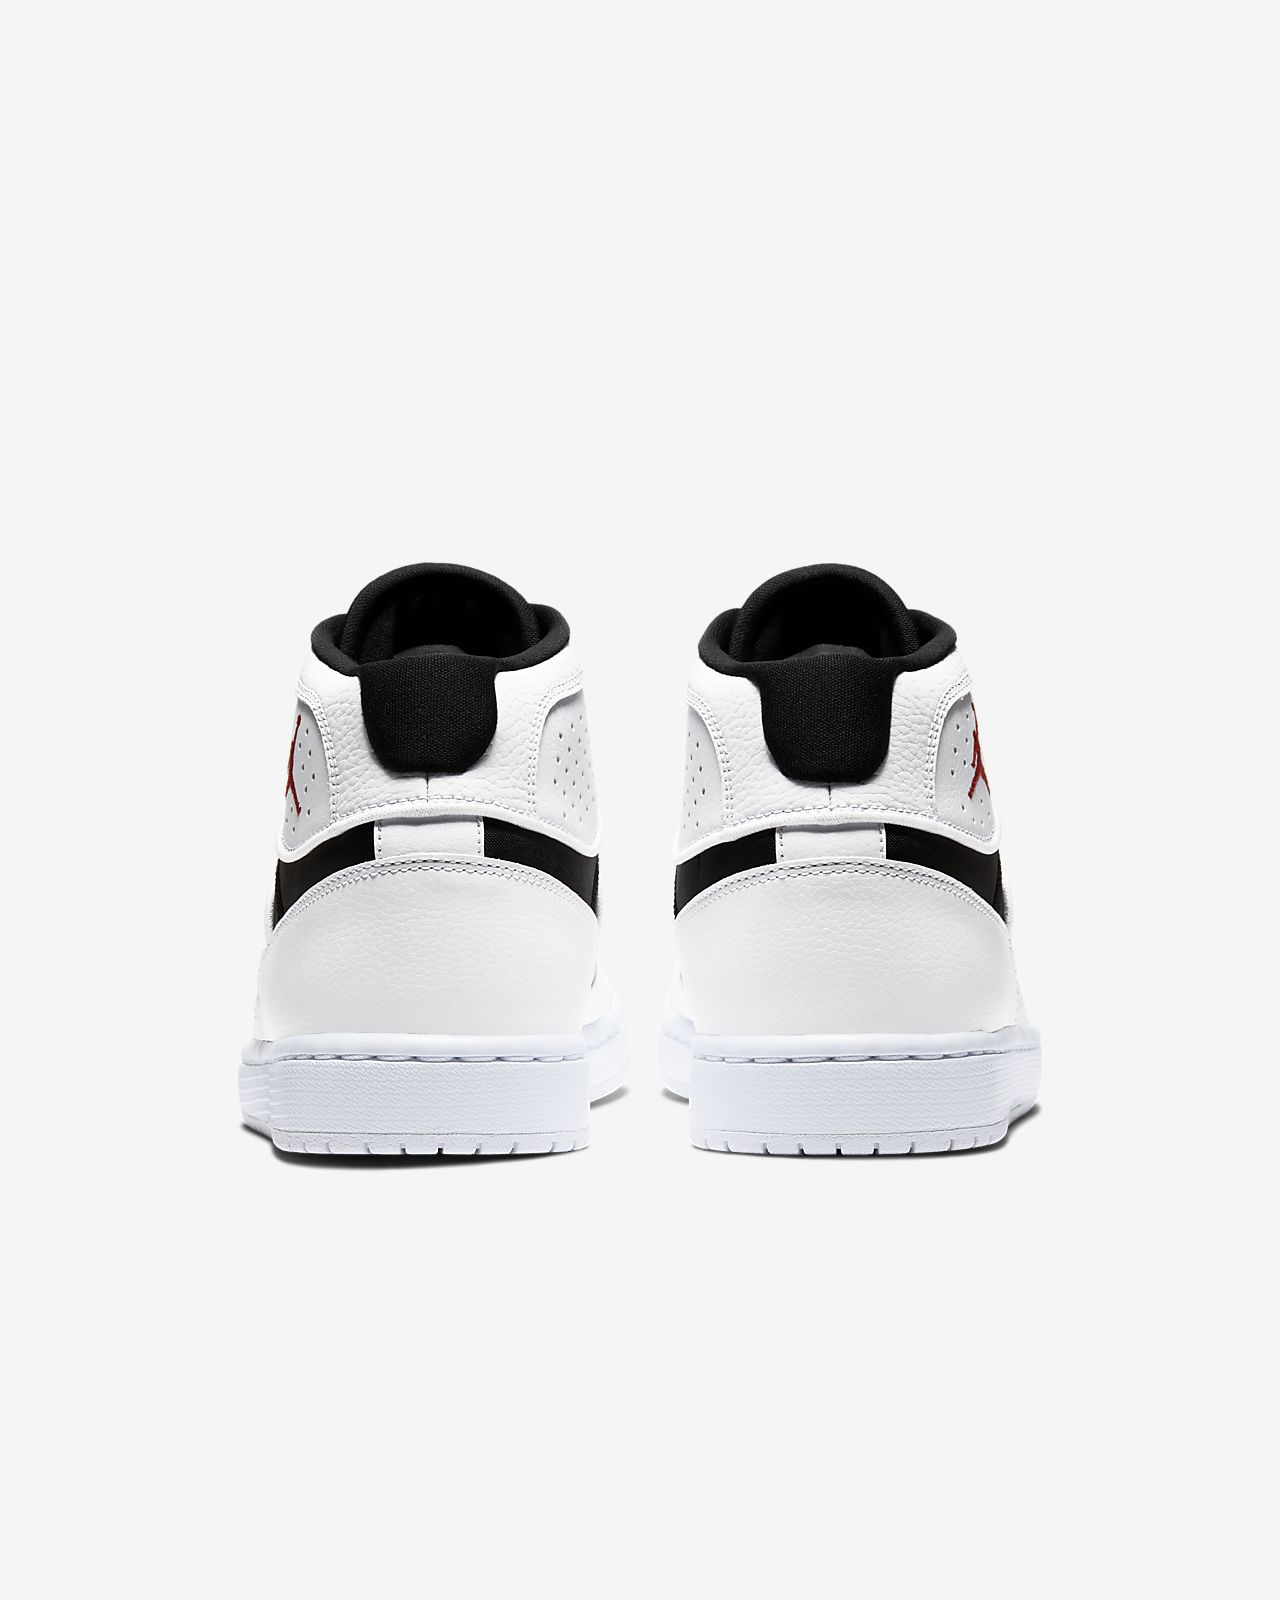 Nike JORDAN ACCESS HERRENSCHUHE BASKETBALLSCHUHE SPORTSCHUHE SCHUHE AR3762-003